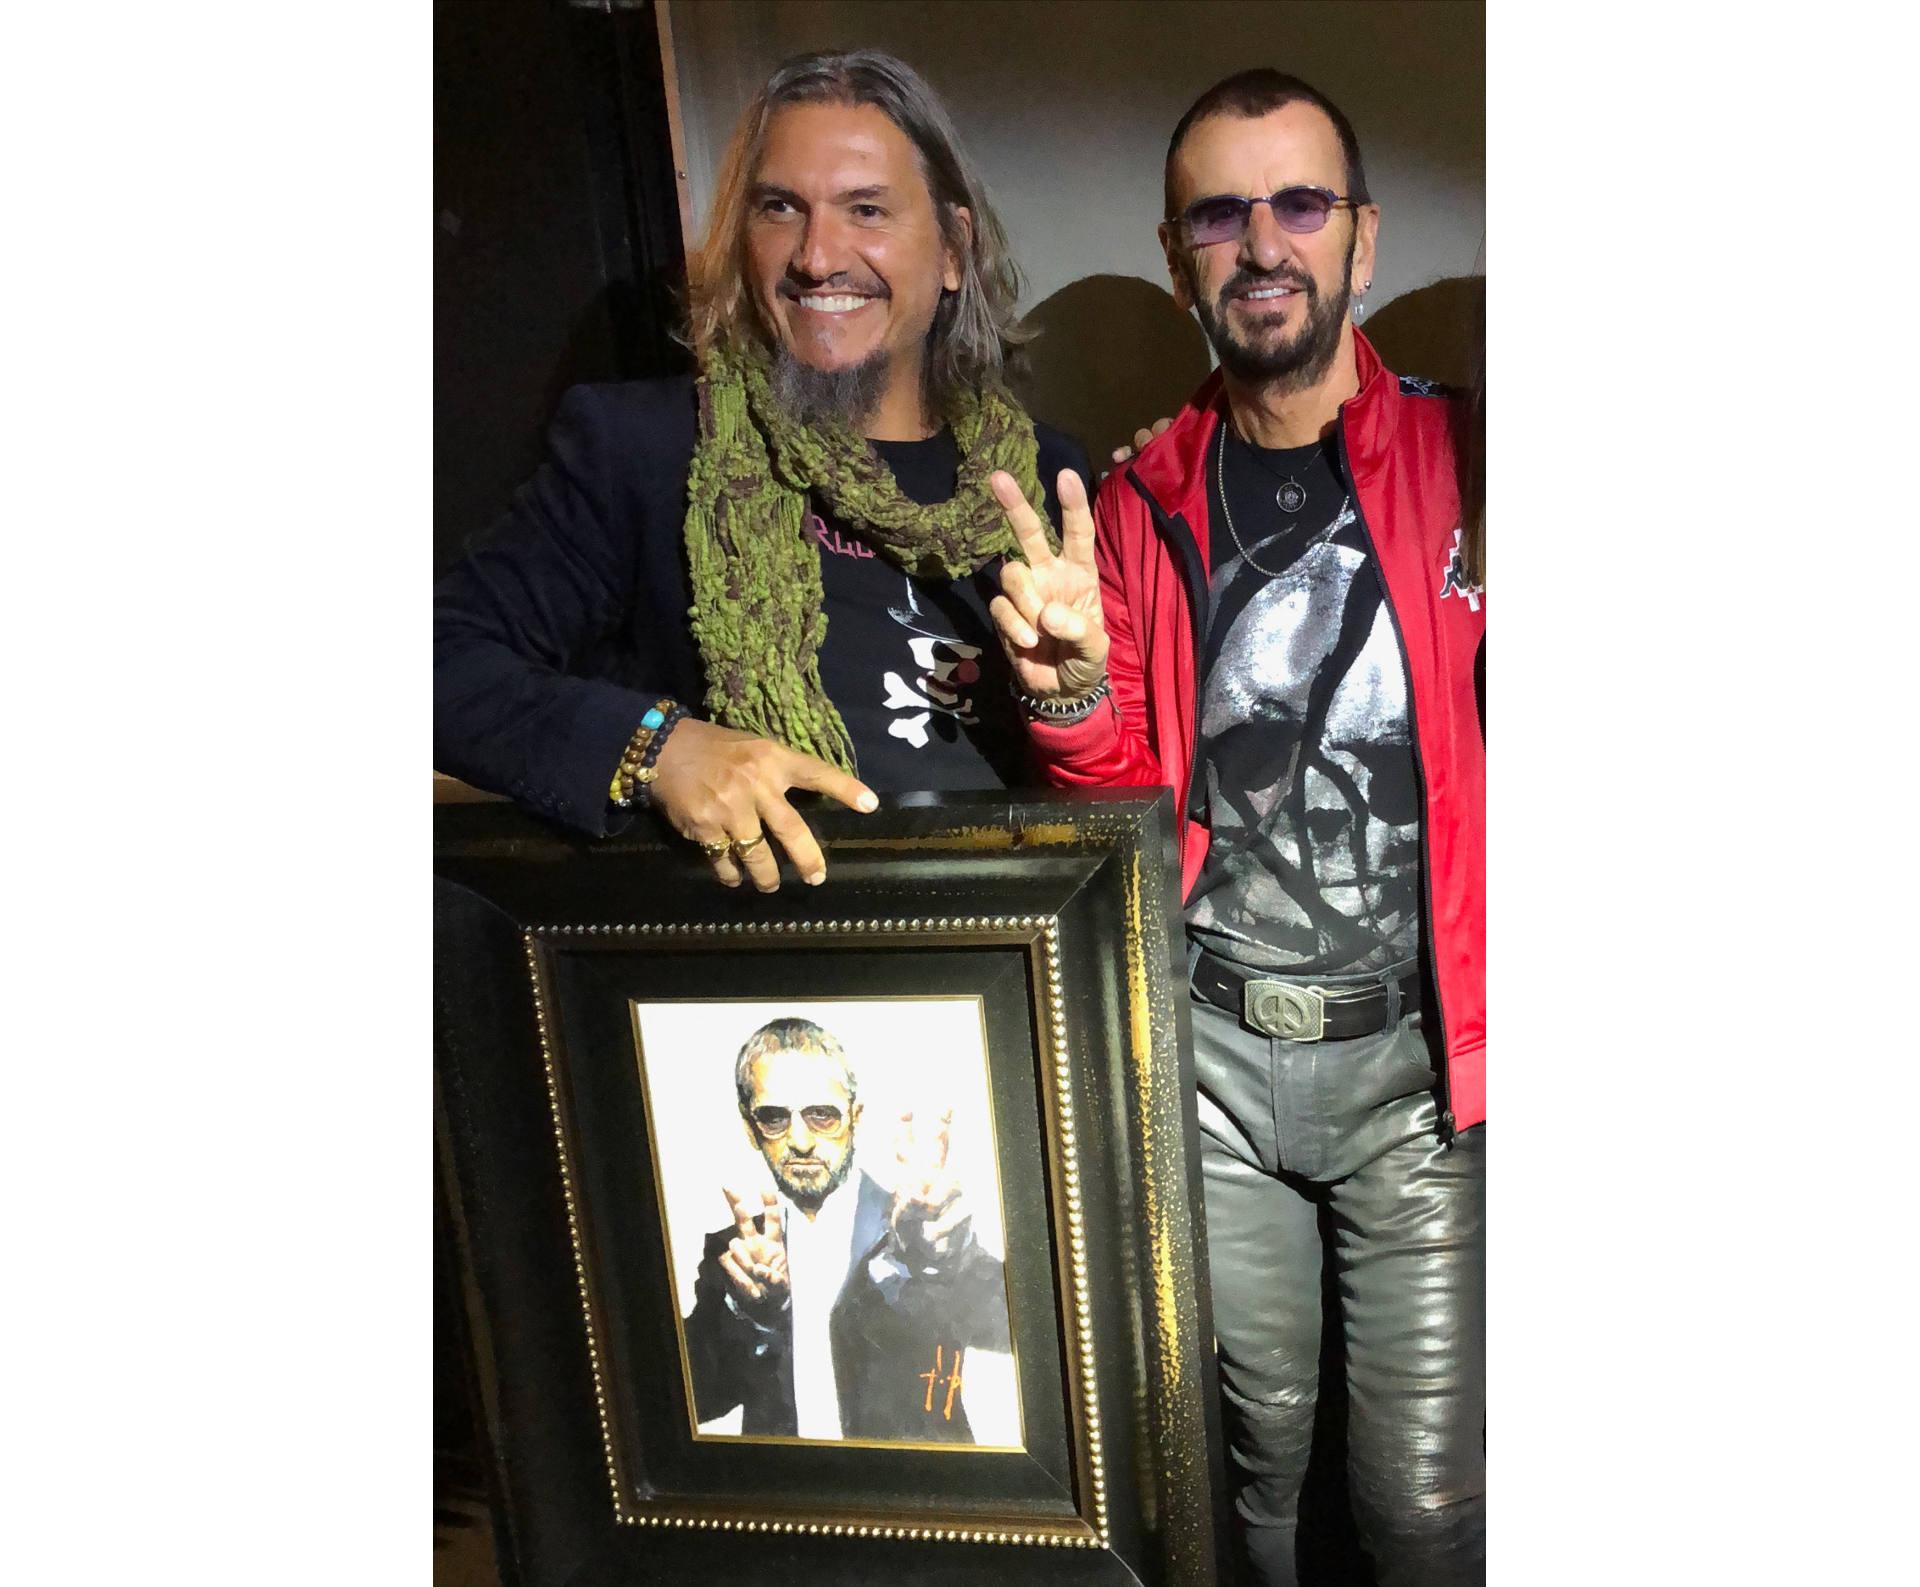 Ringo Starr standing next to Fabian Perez holding portrait